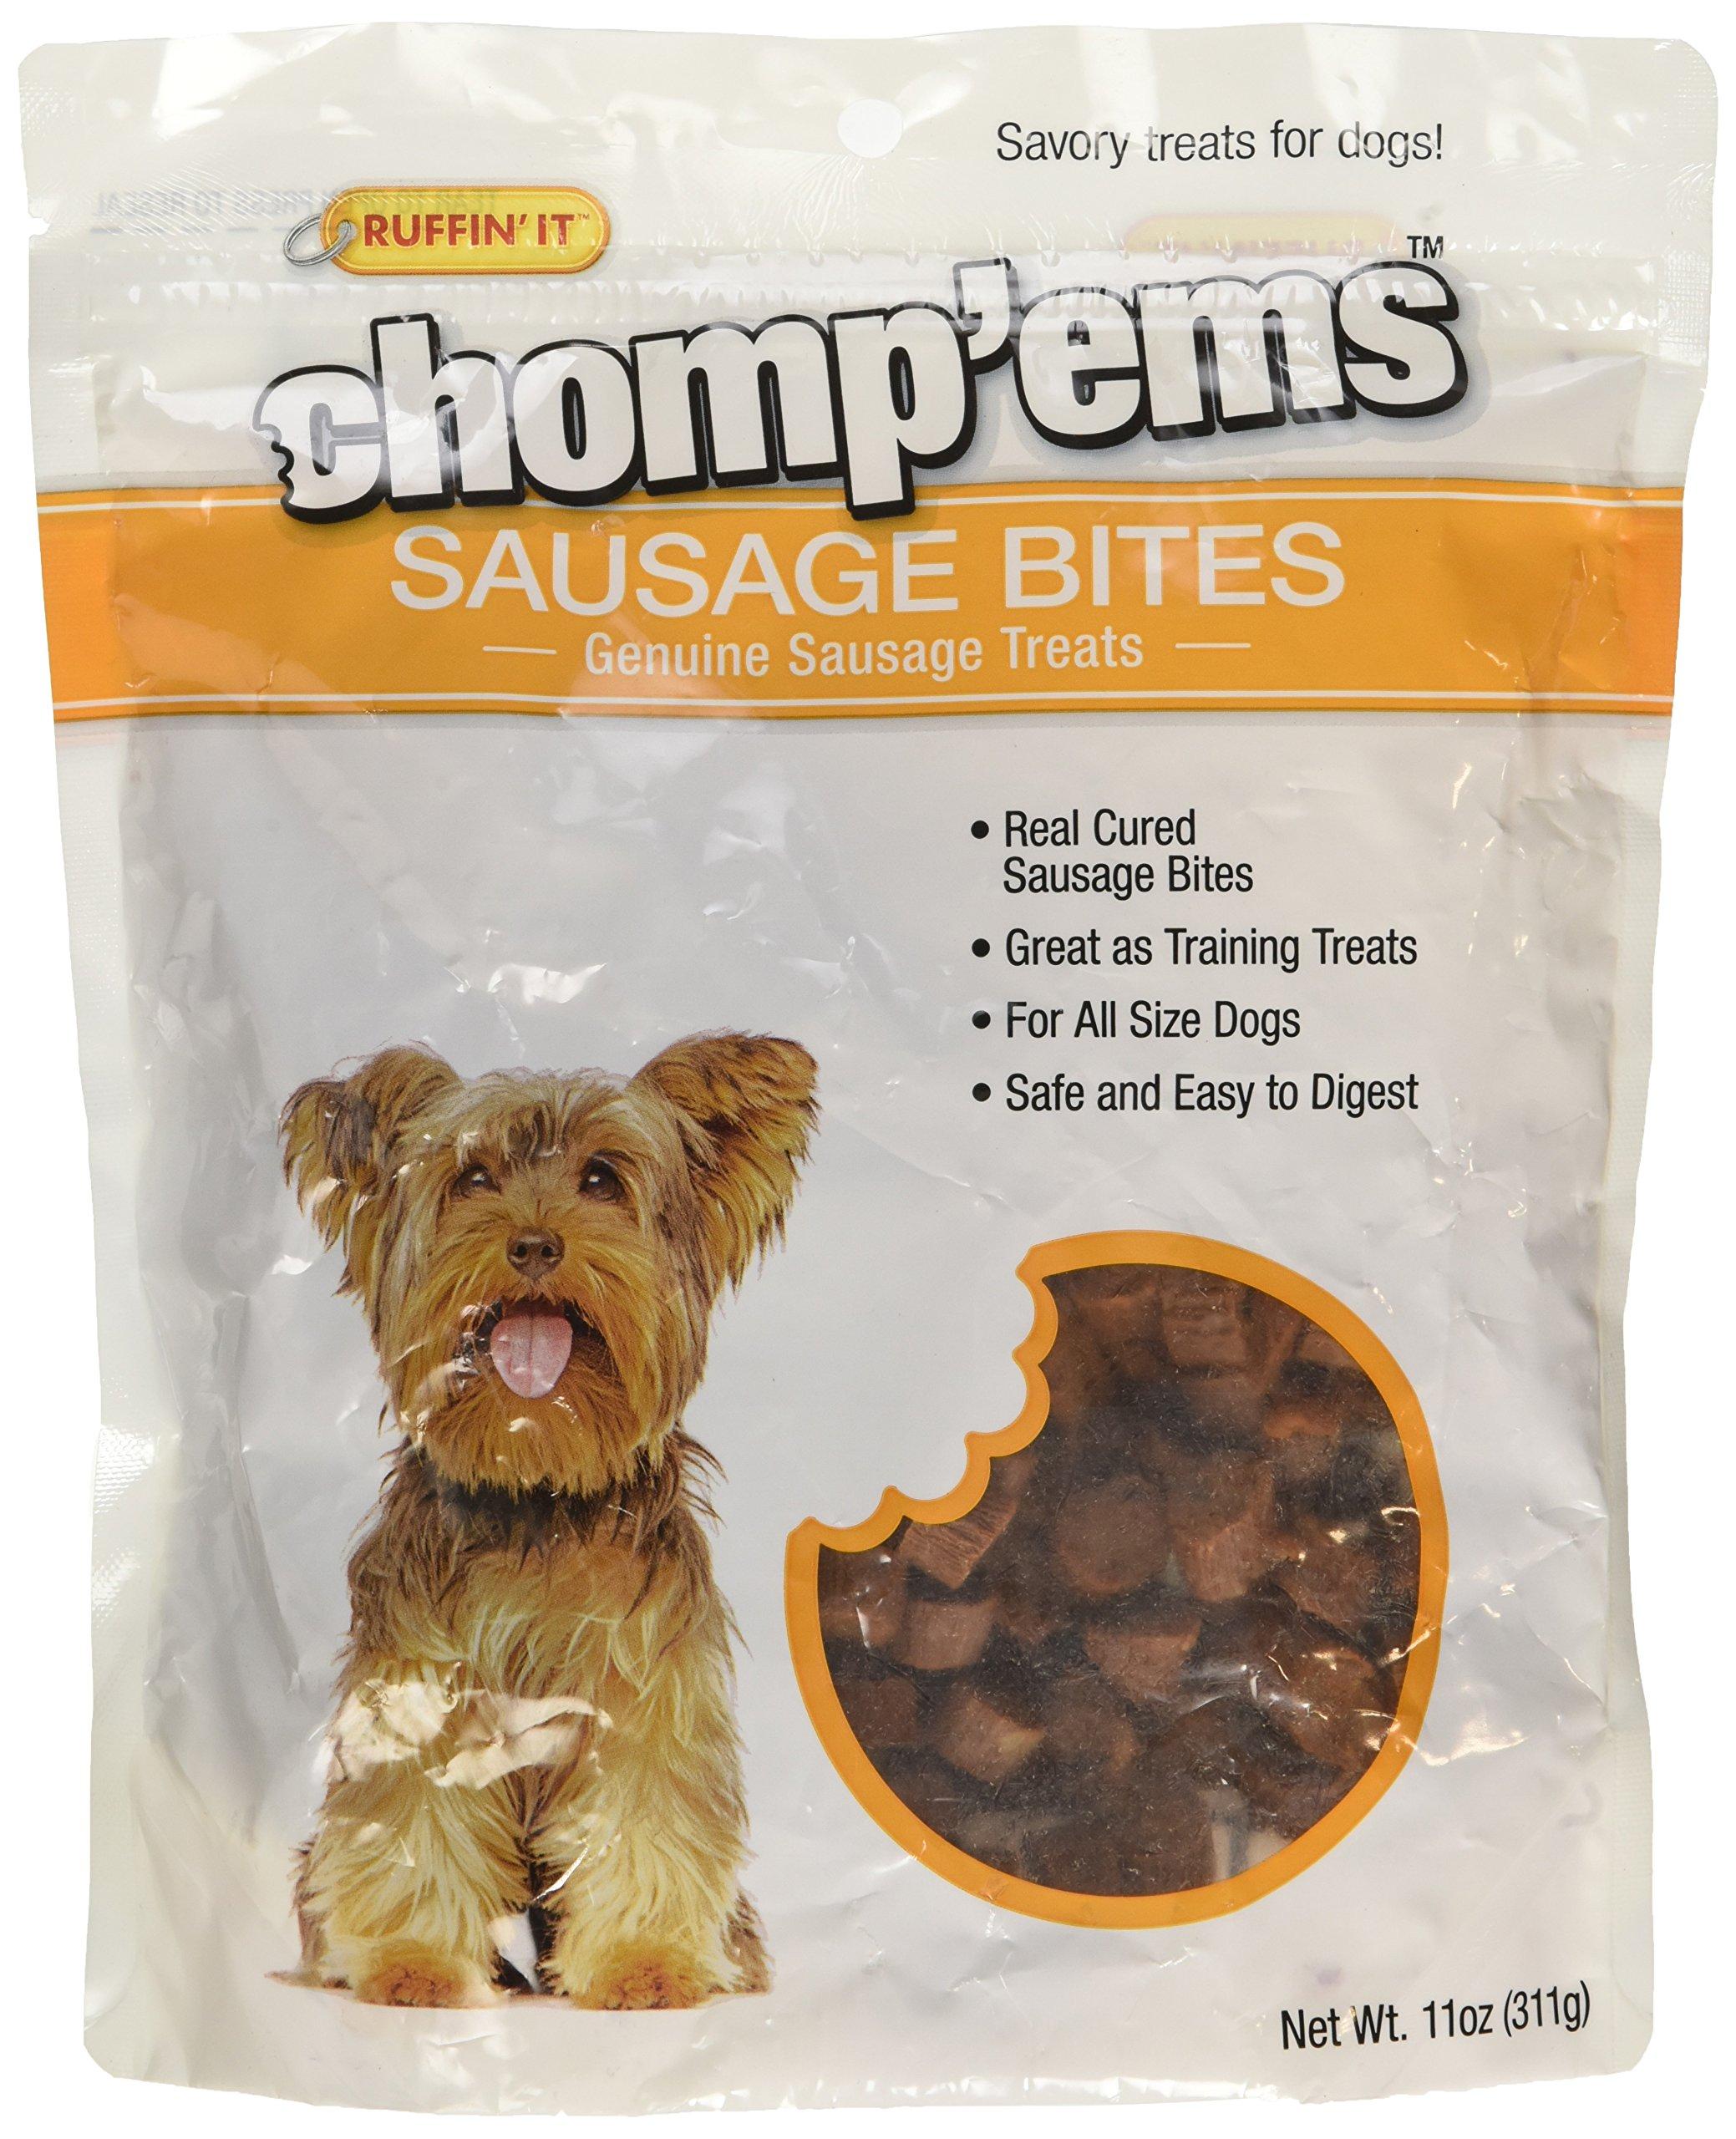 Westminster Pet Products Chomp'ems Sausage Bites, 11 oz